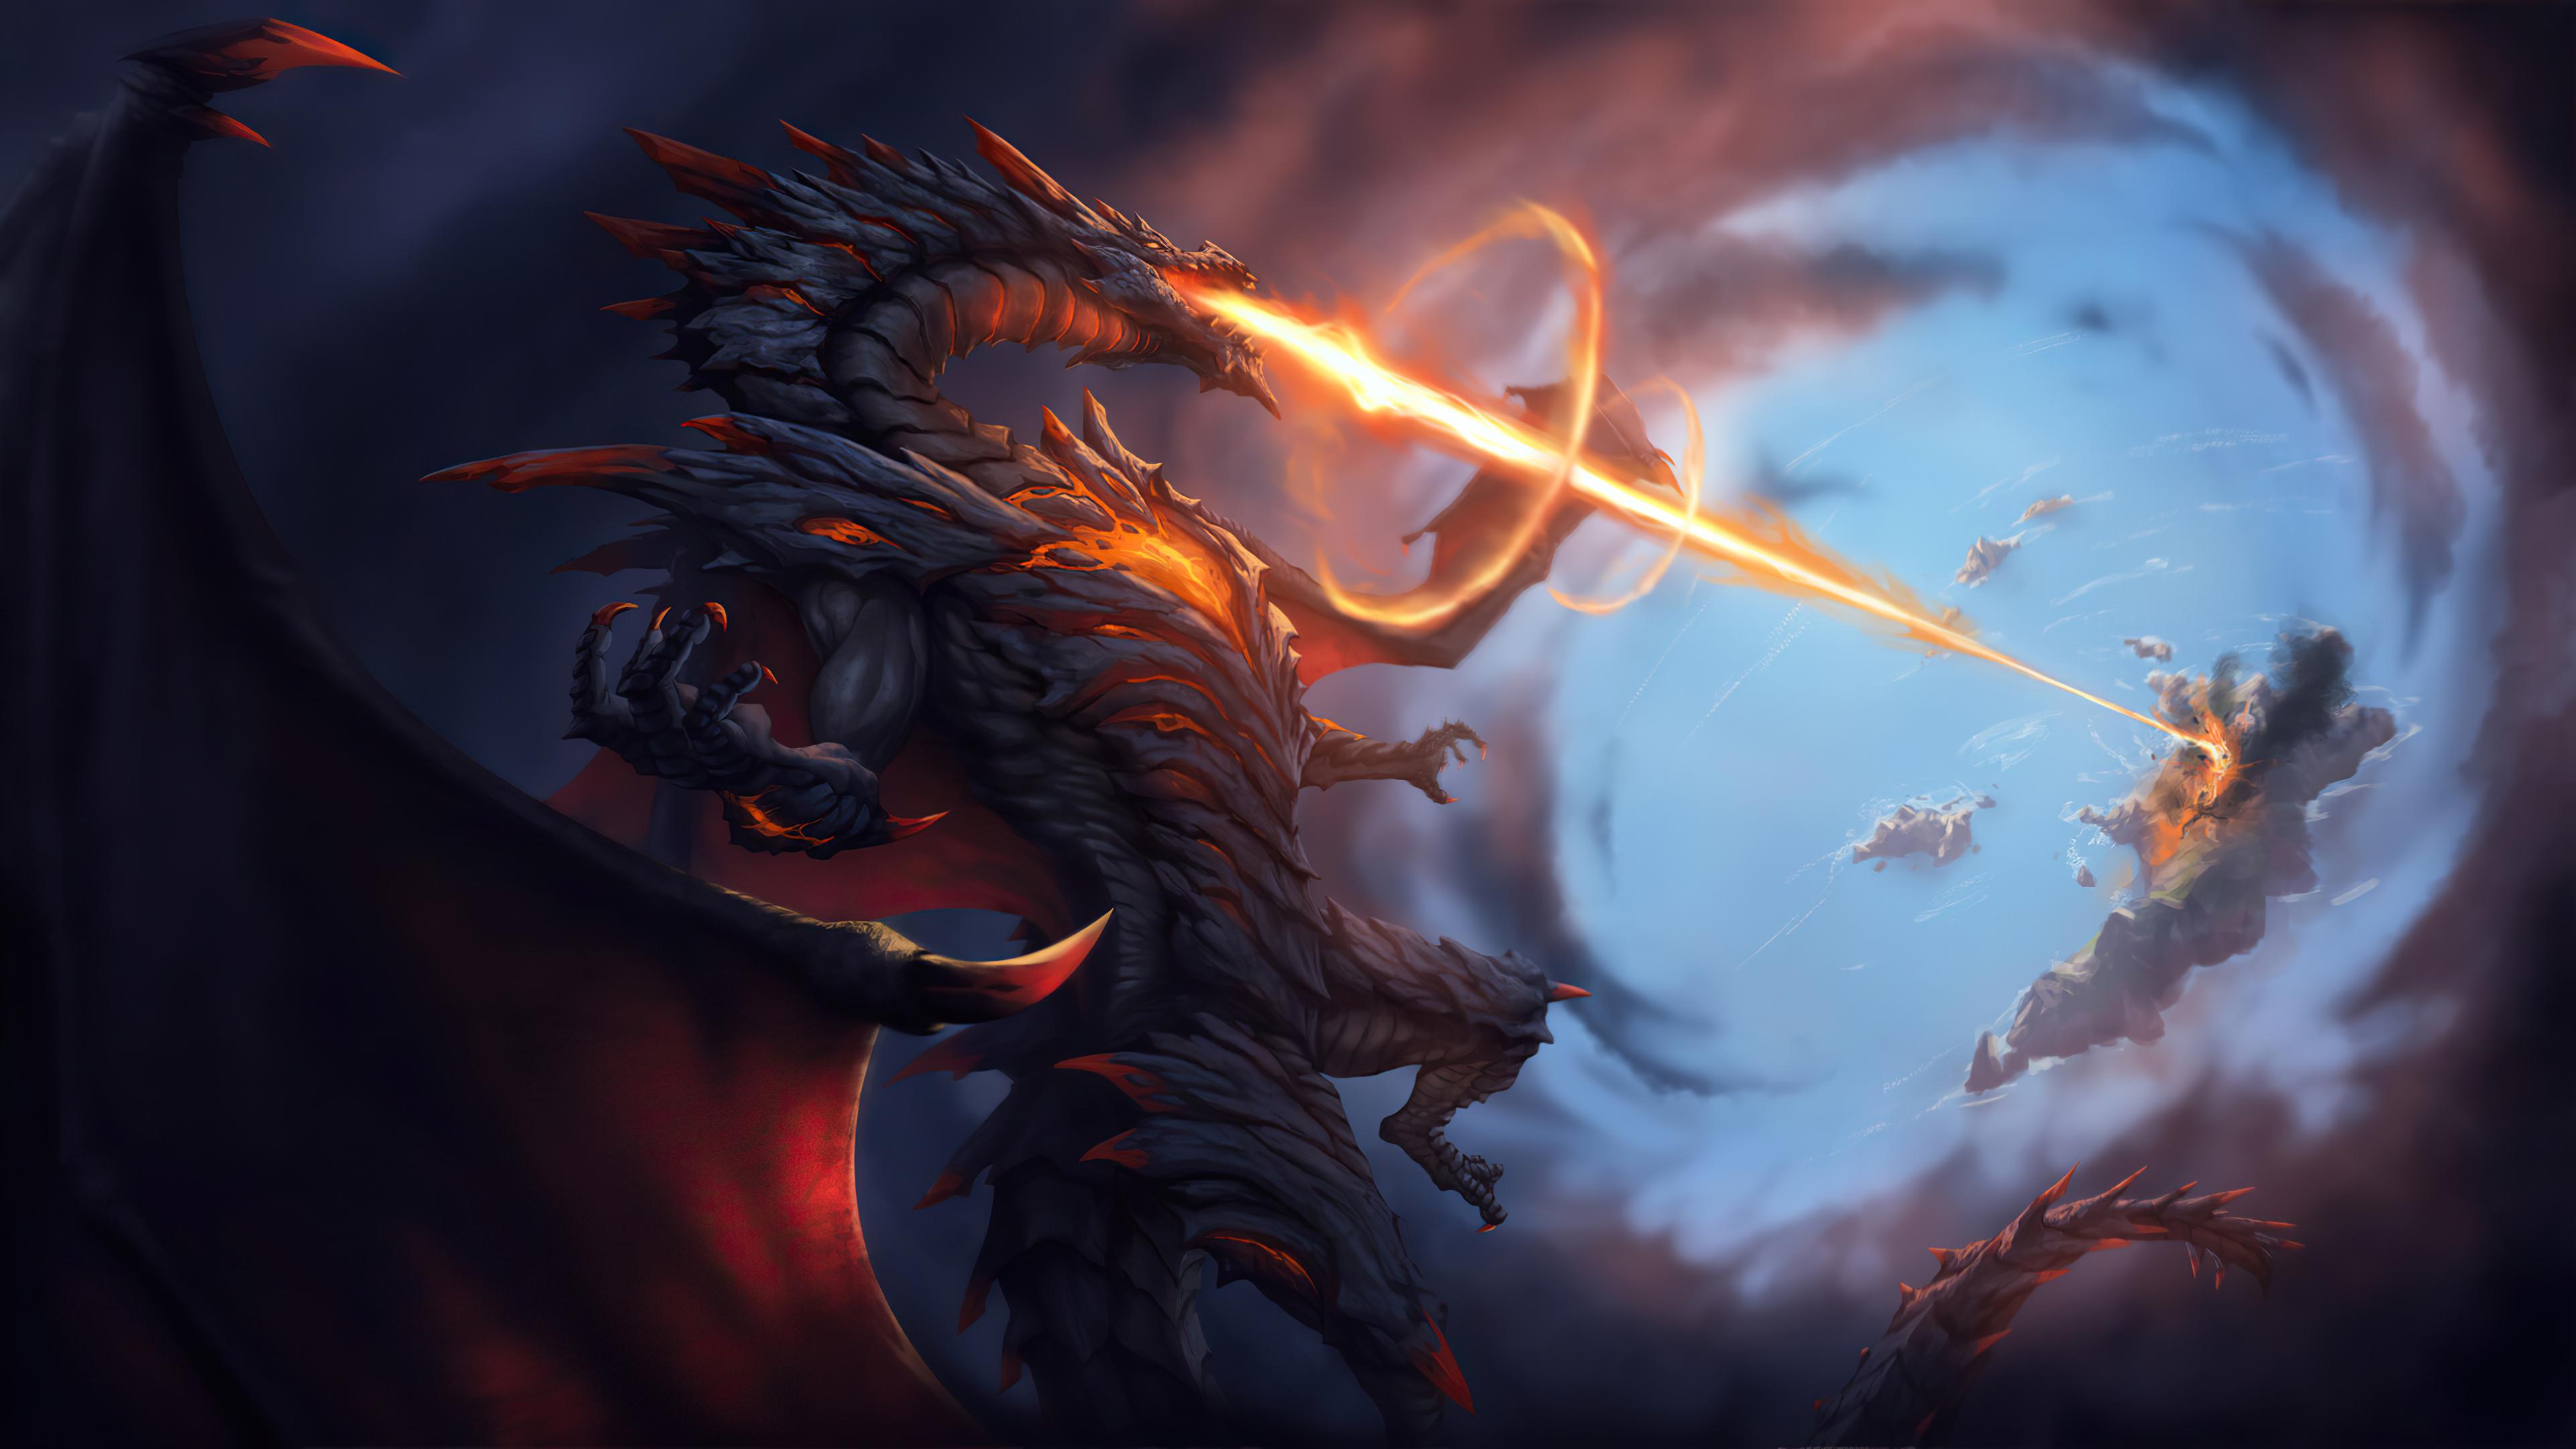 Angry Dragon 4K Art Wallpaper, HD Fantasy 4K Wallpapers ...